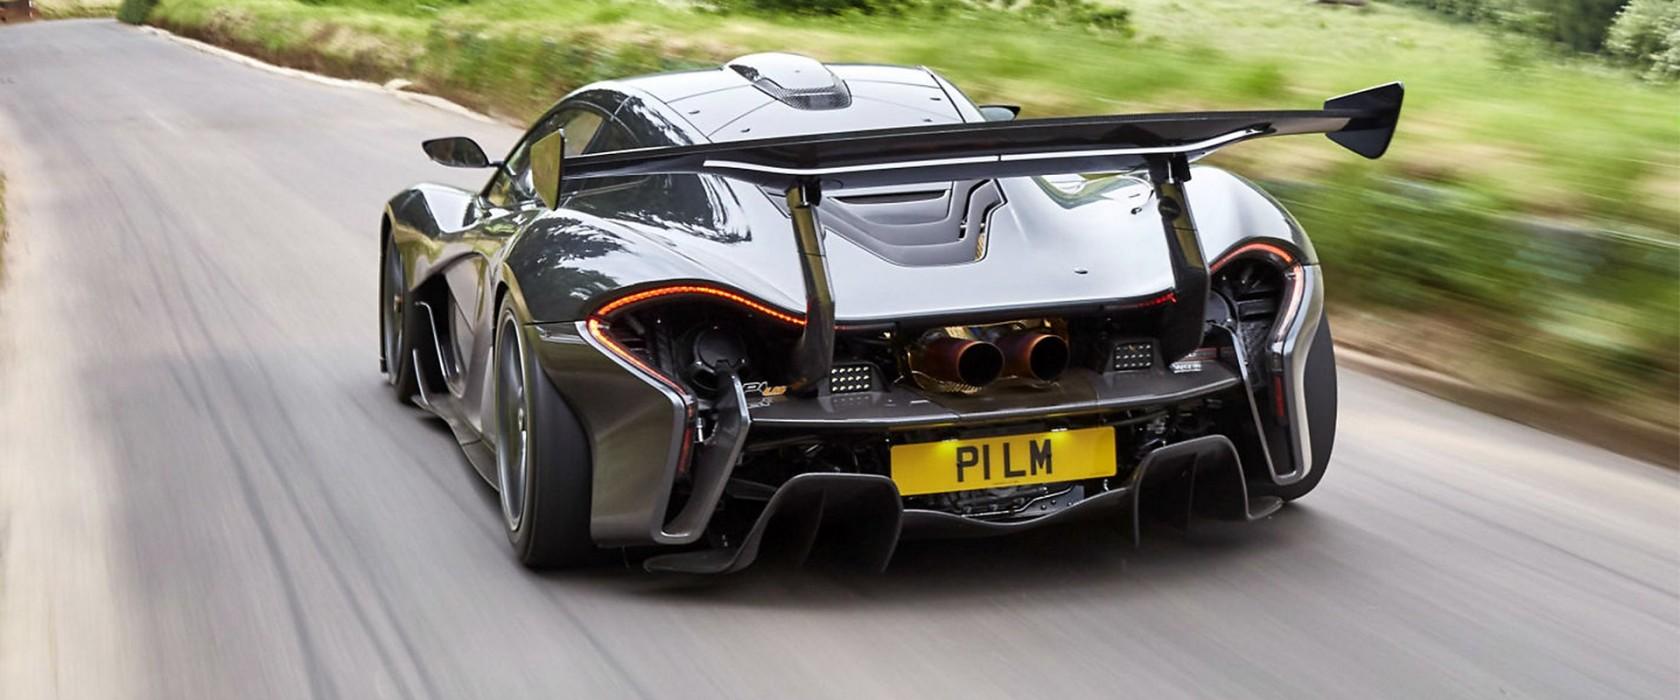 McLarenP1LM-apertura